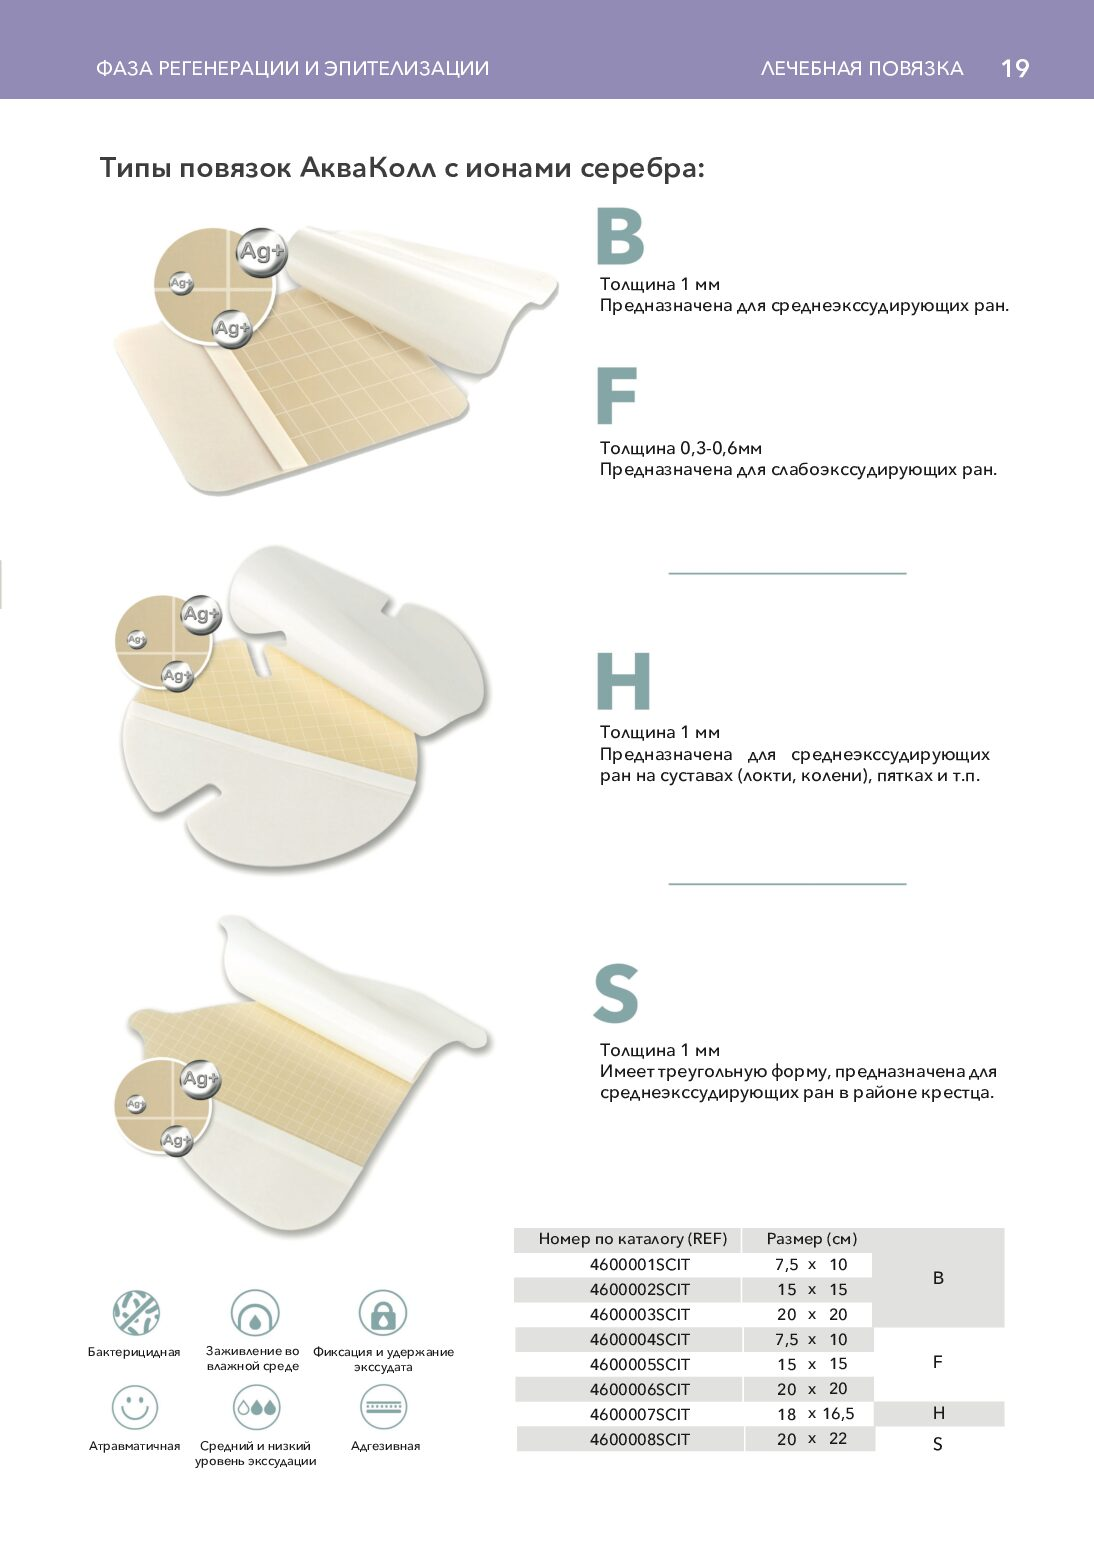 продукции Optimelle 19 pdf